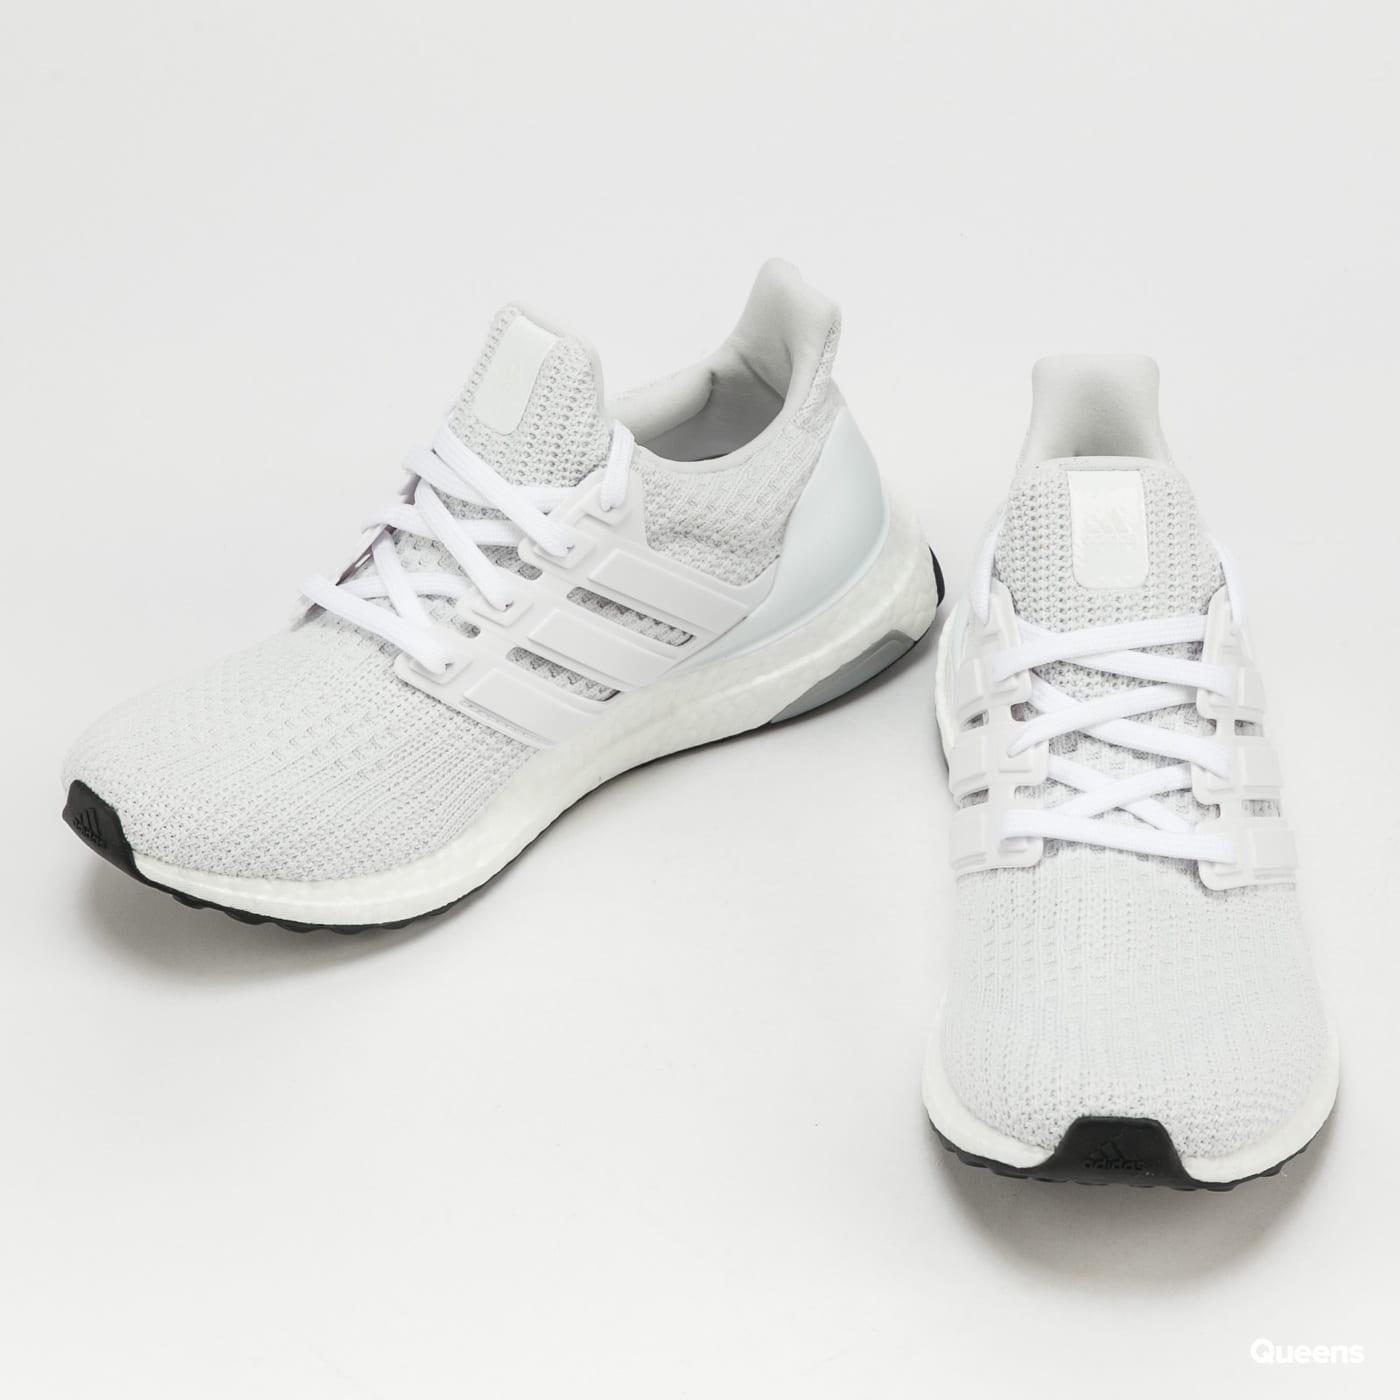 adidas Performance UltraBoost 4.0 DNA W ftwwht / ftwwht / cblack